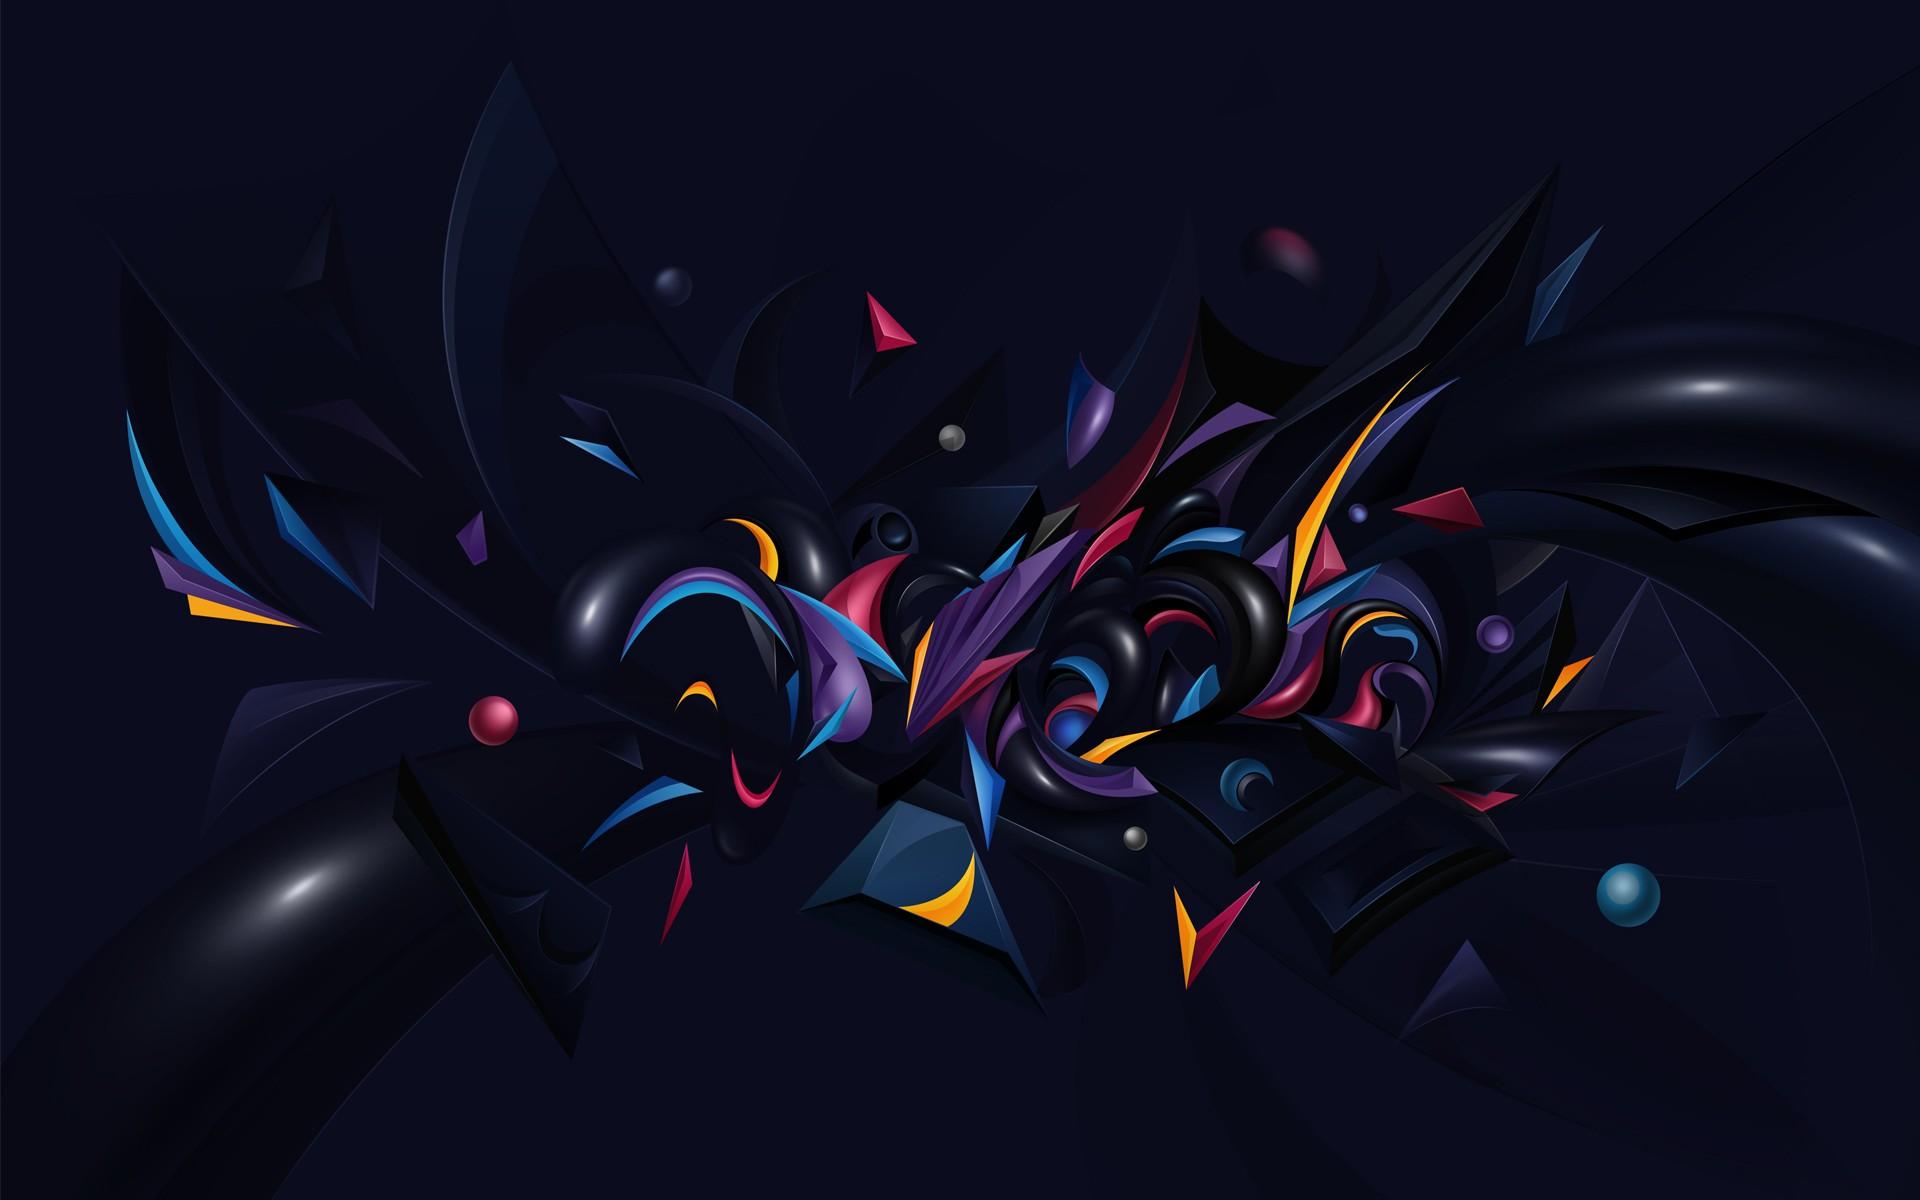 Fullscreen HD Wallpapers Free Download   PixelsTalk.Net